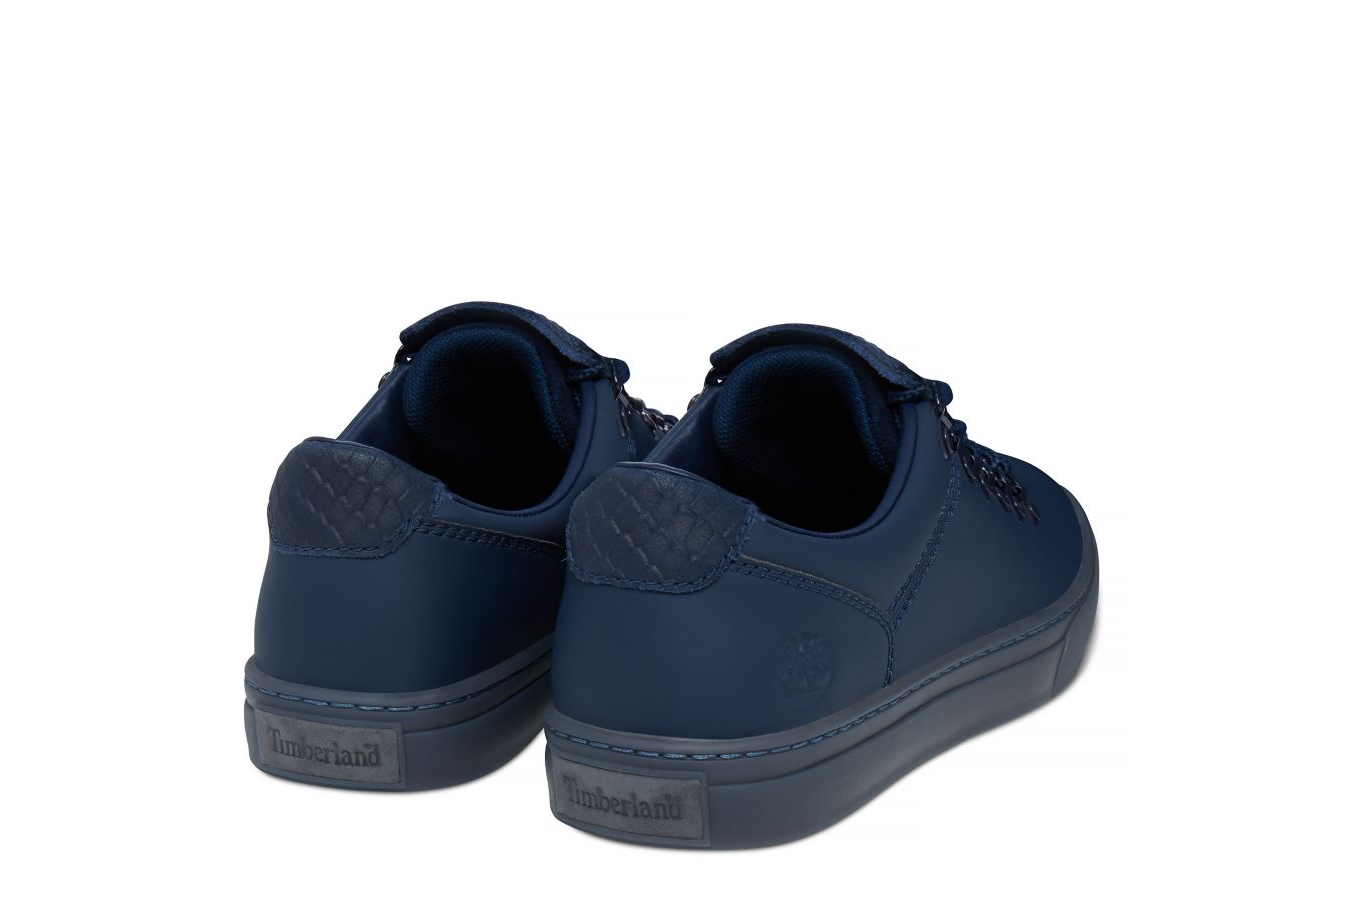 Vente Timberland chaussures pour homme toutes les